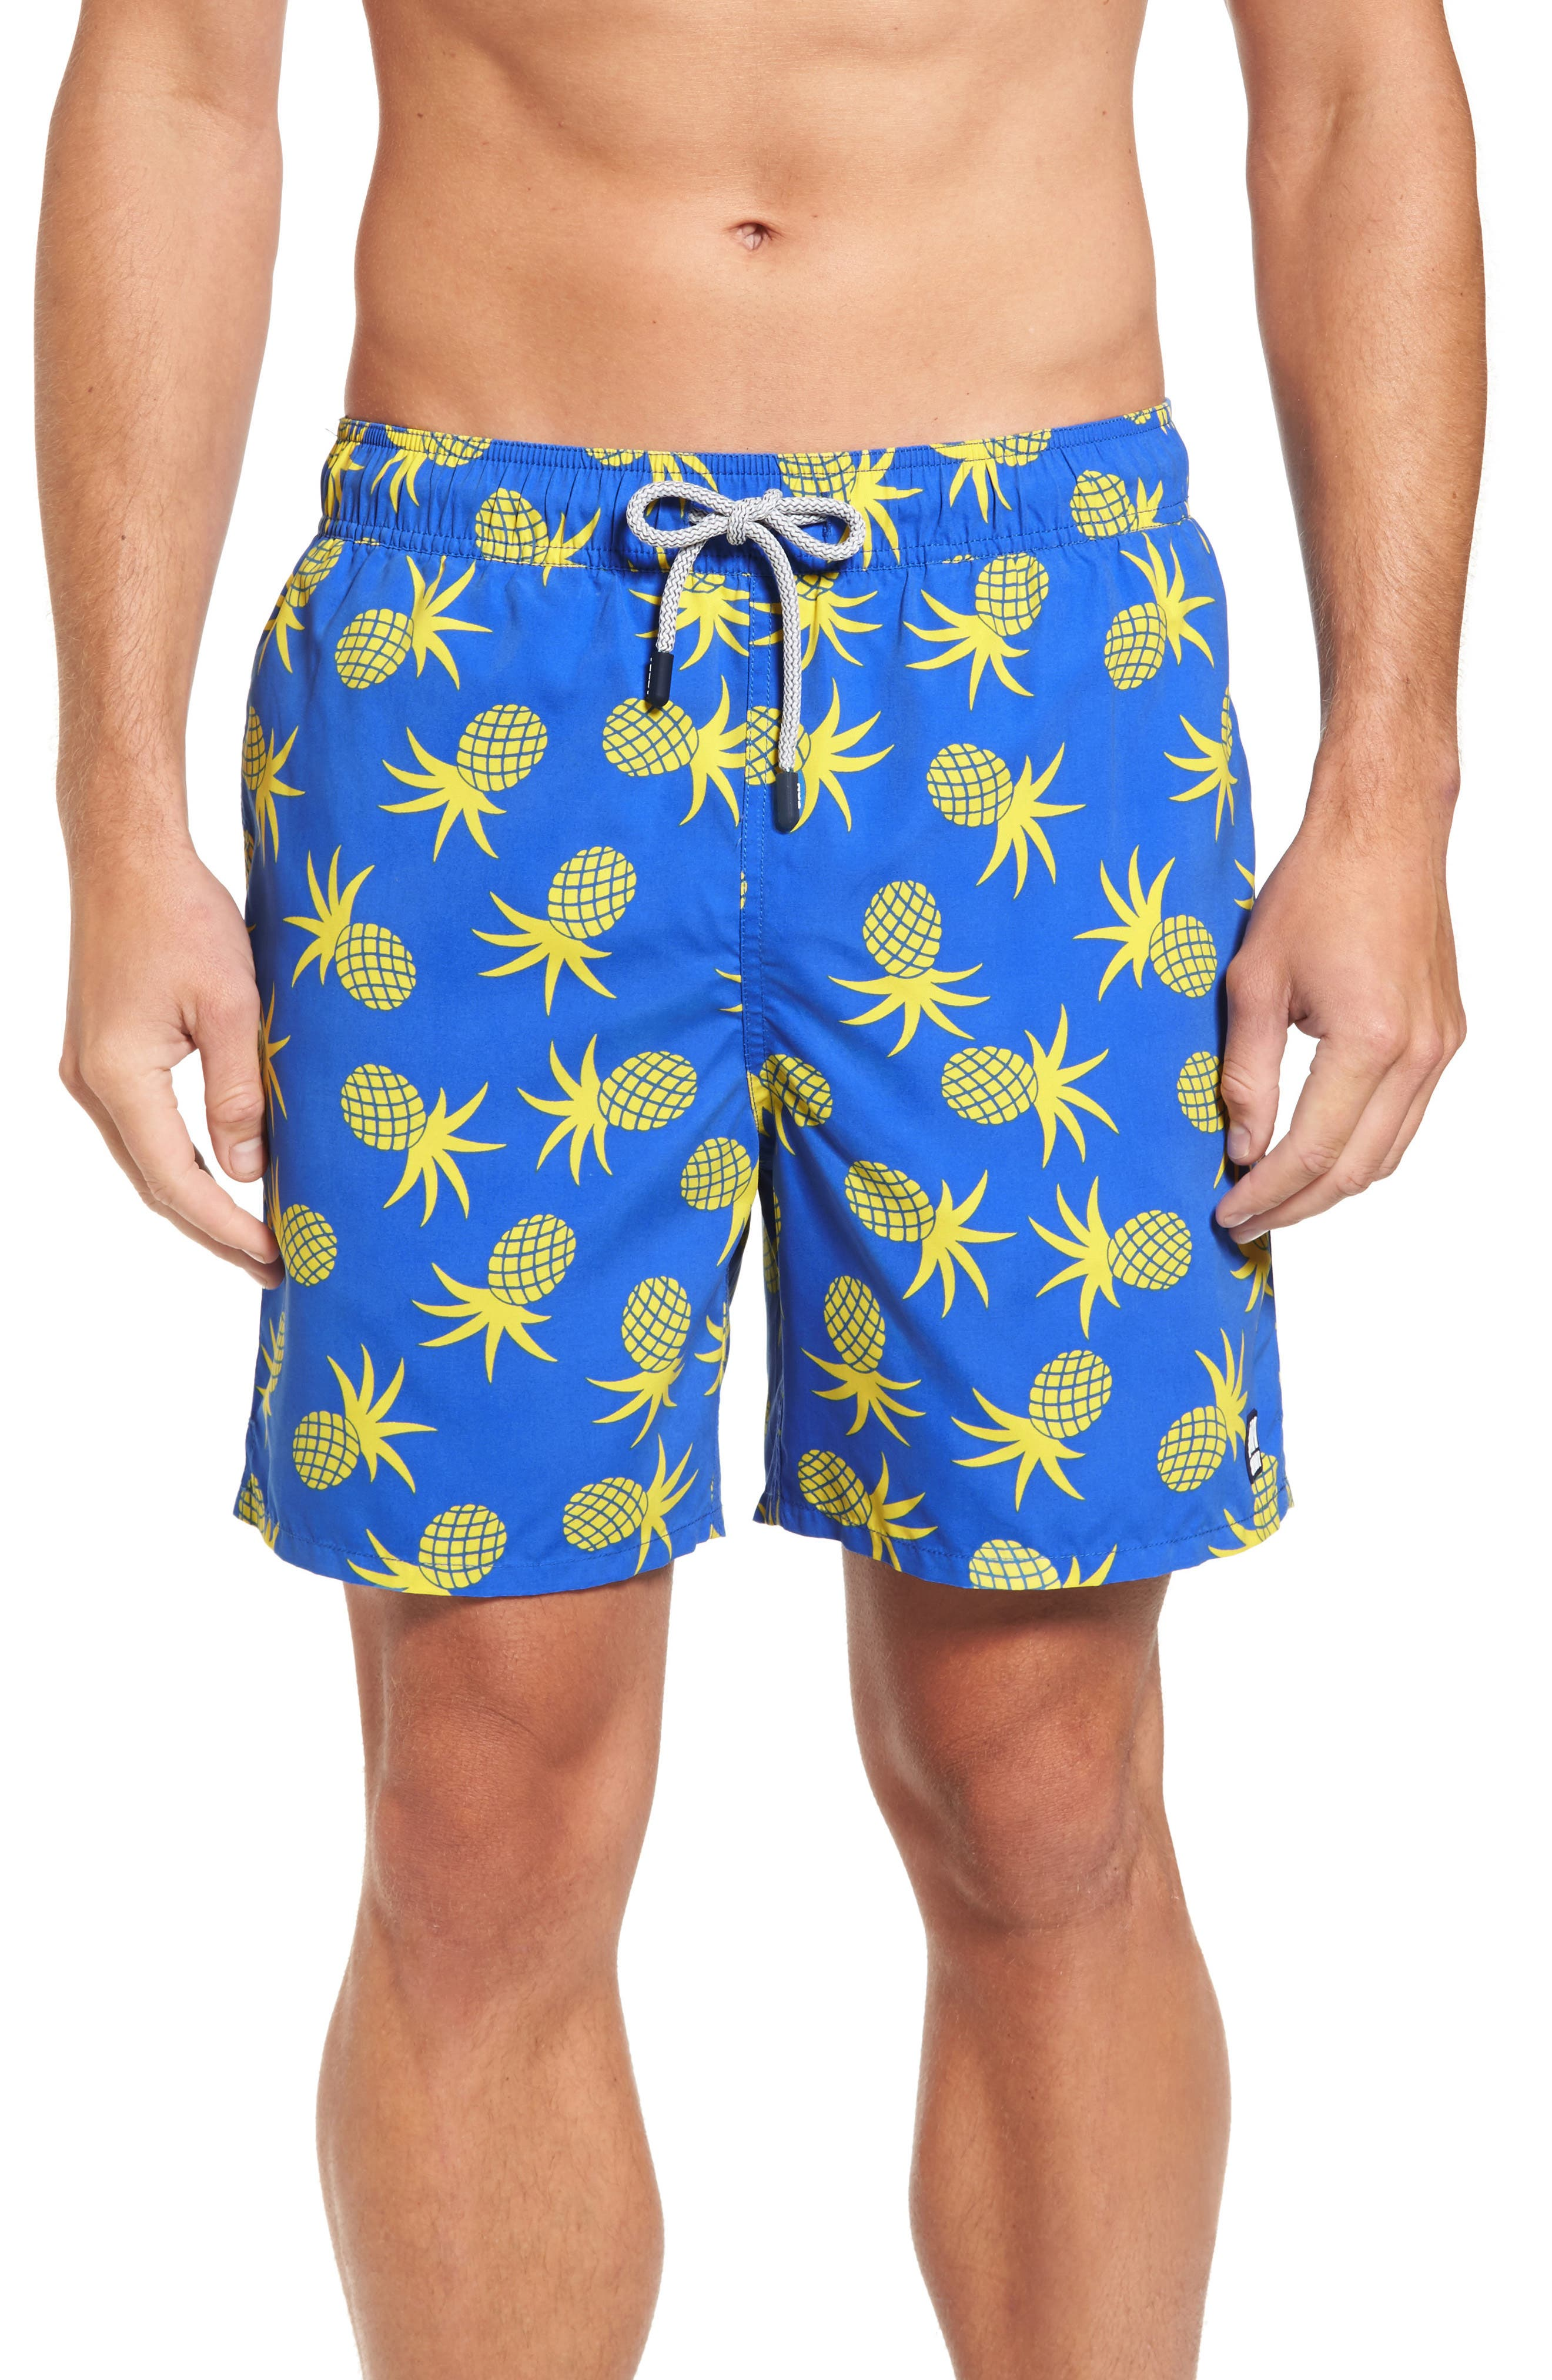 Pineapple Swim Trunks,                         Main,                         color, 430